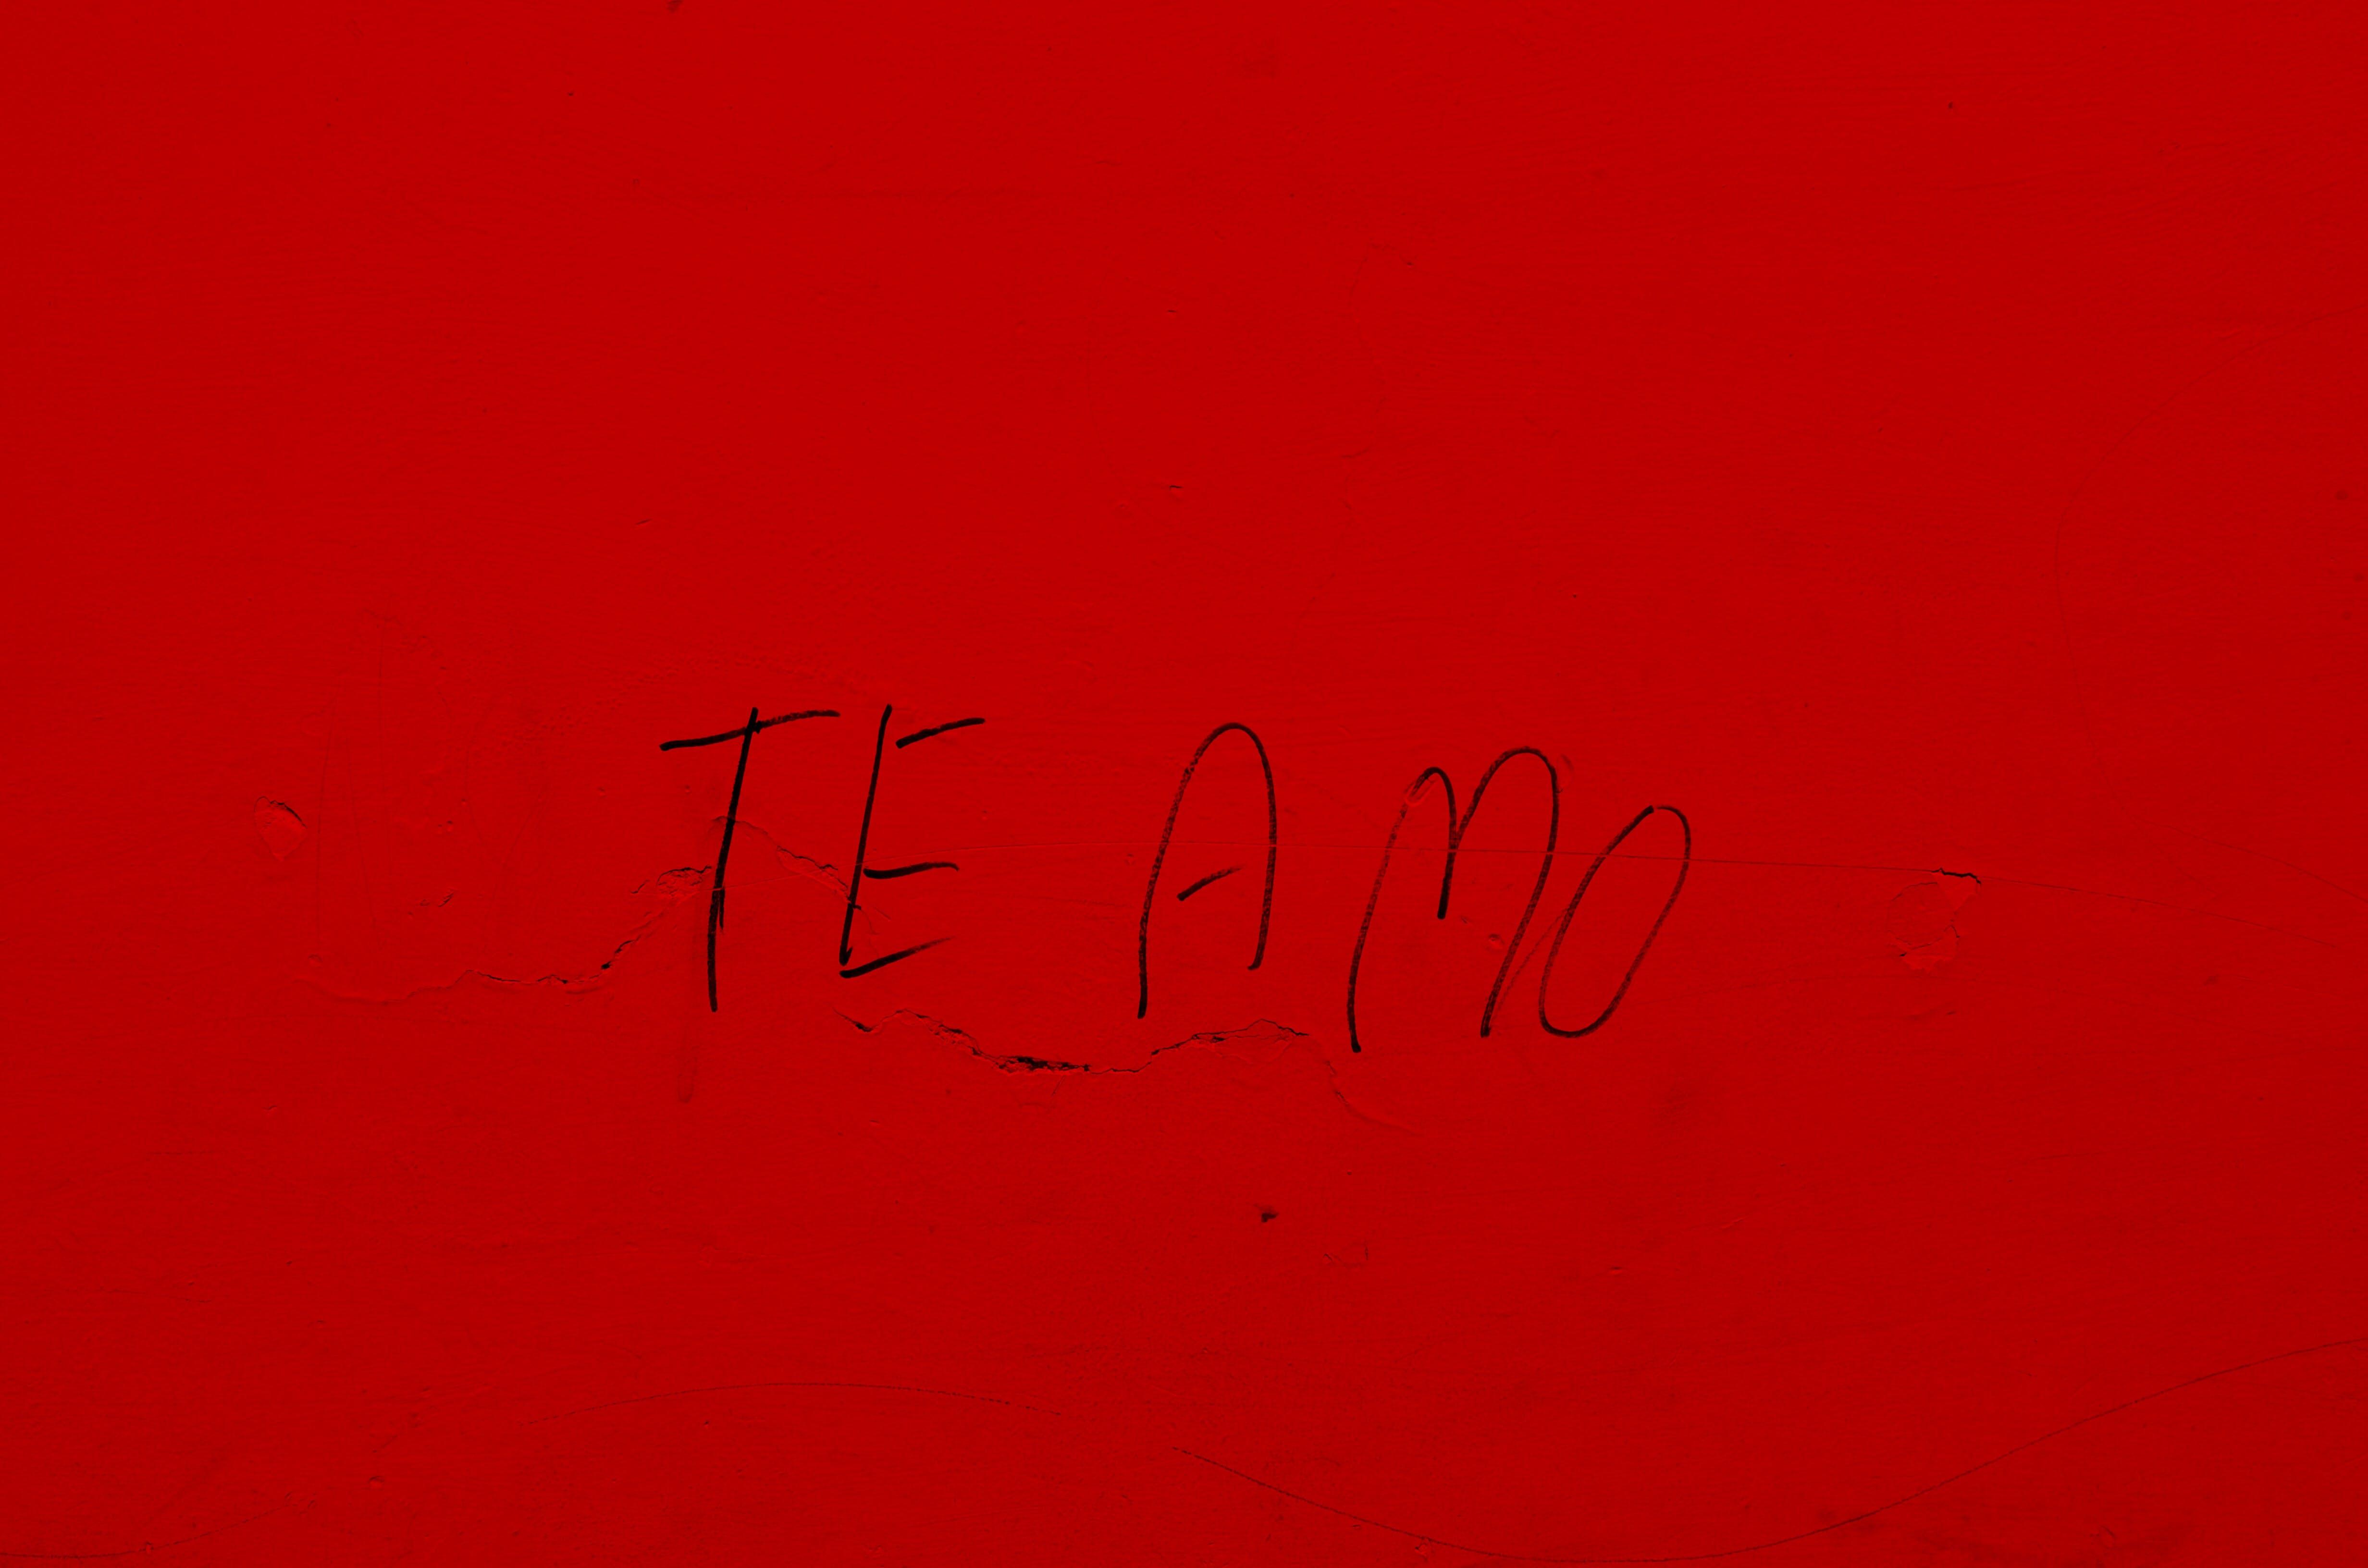 Free stock photo of amor, graffiti, handwritten, happy valentines day